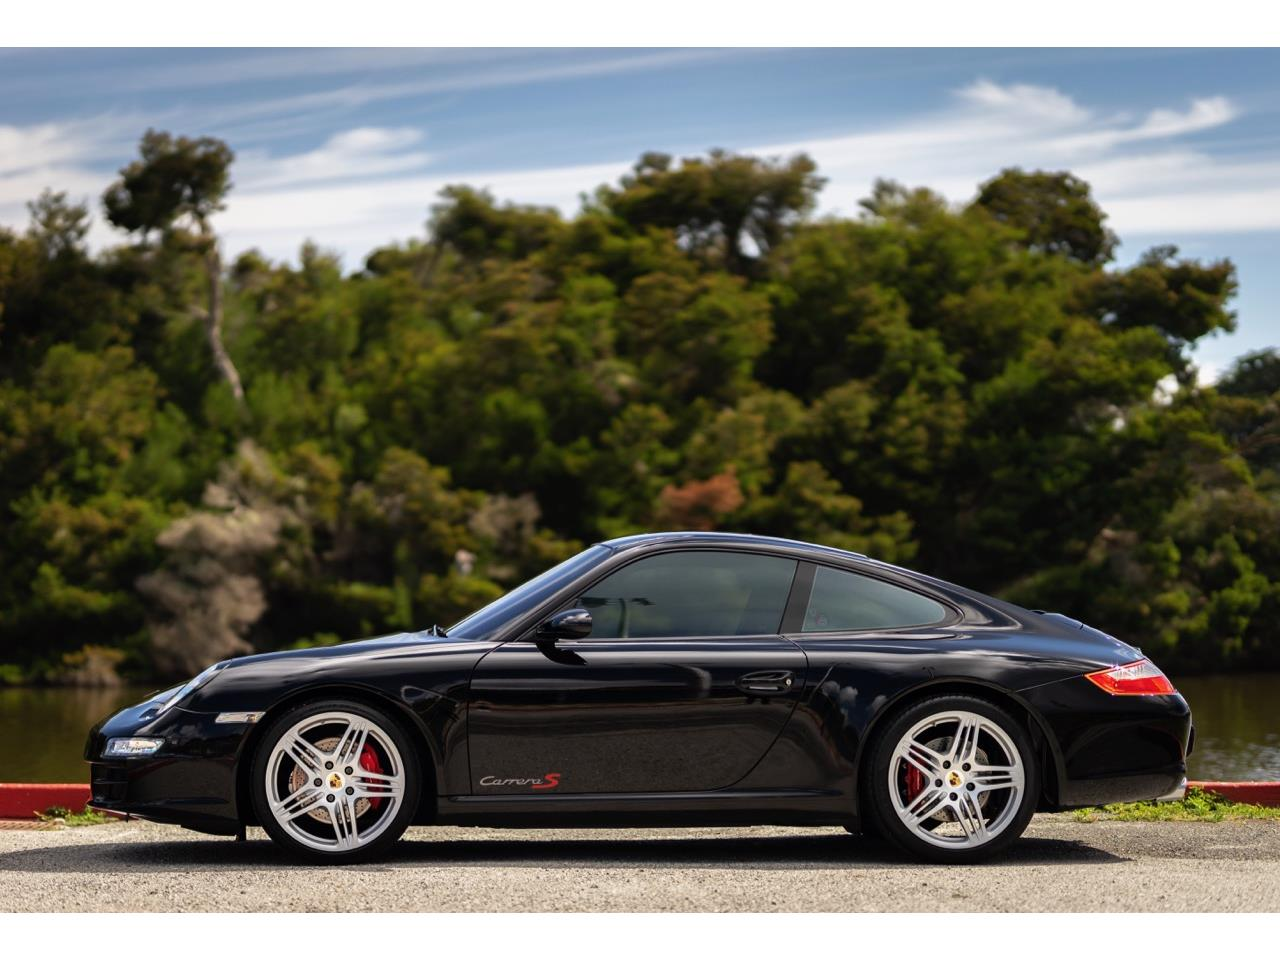 Large Picture of '08 911 Carrera S located in Monterey California - $59,500.00 - Q67H